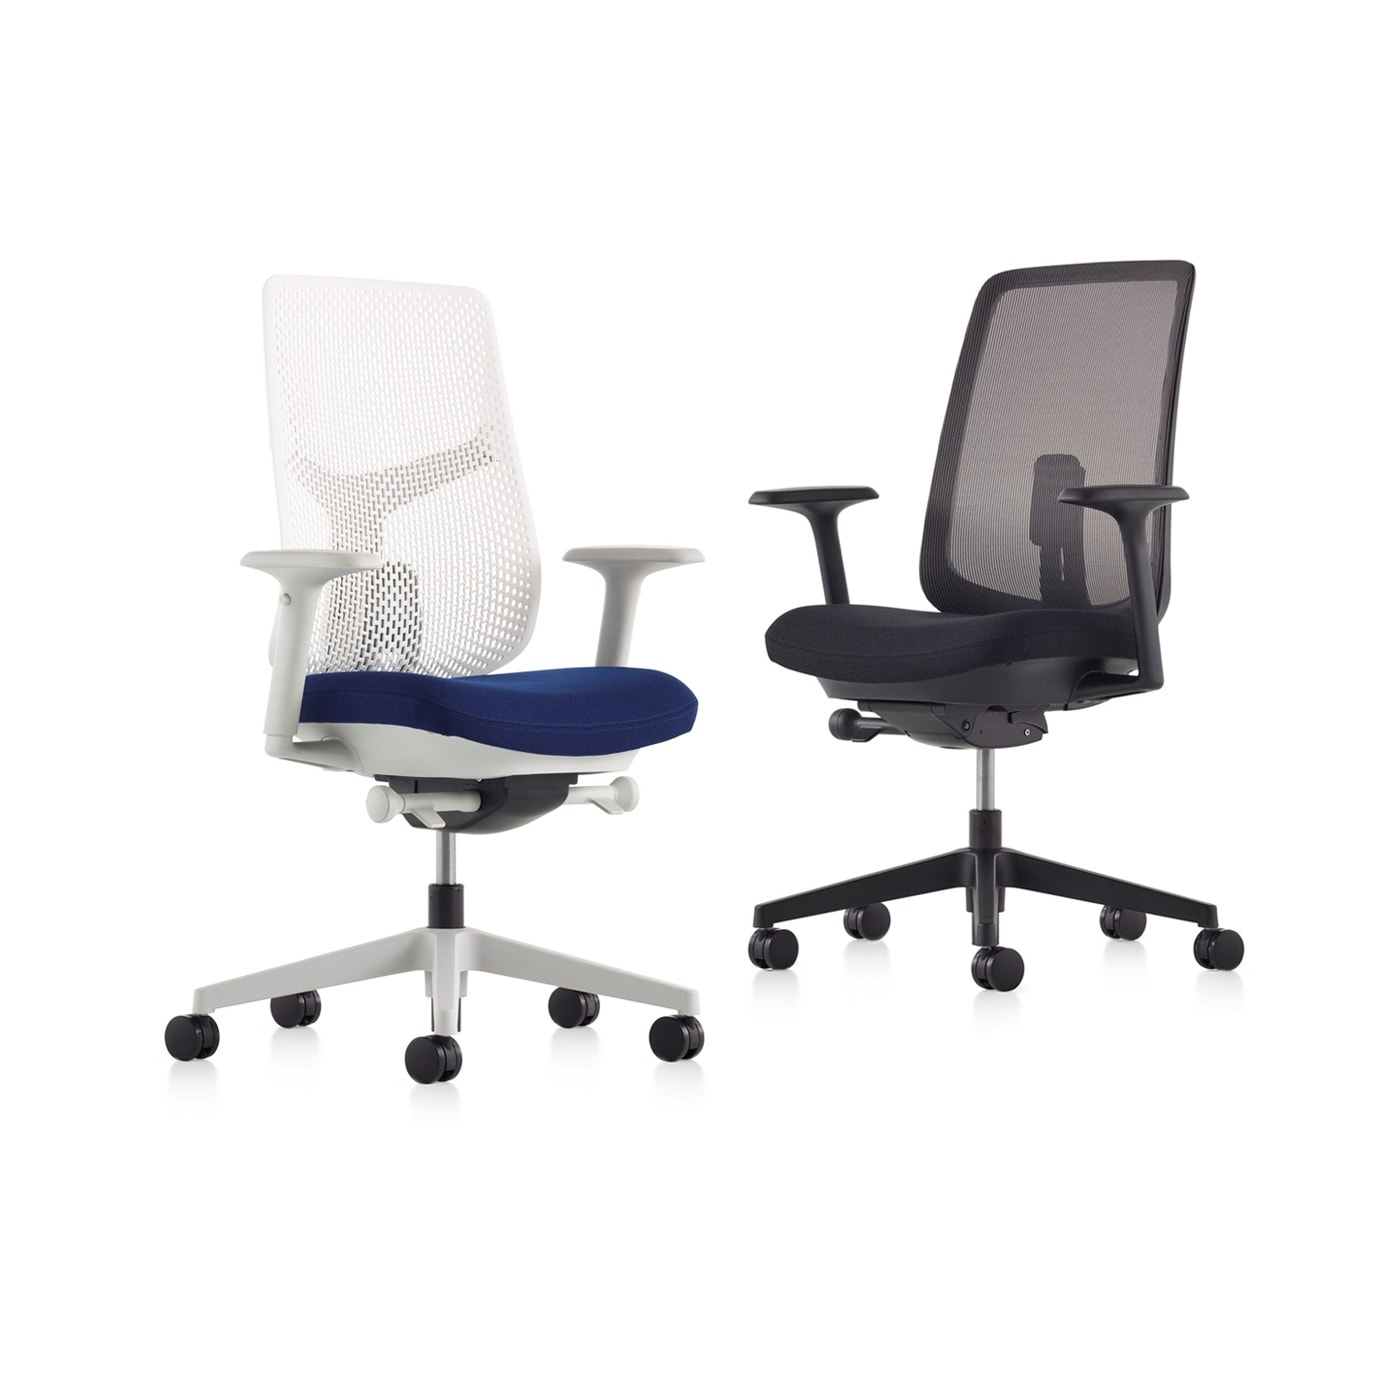 Herman Miller Verus poltrona ufficio - vendita online